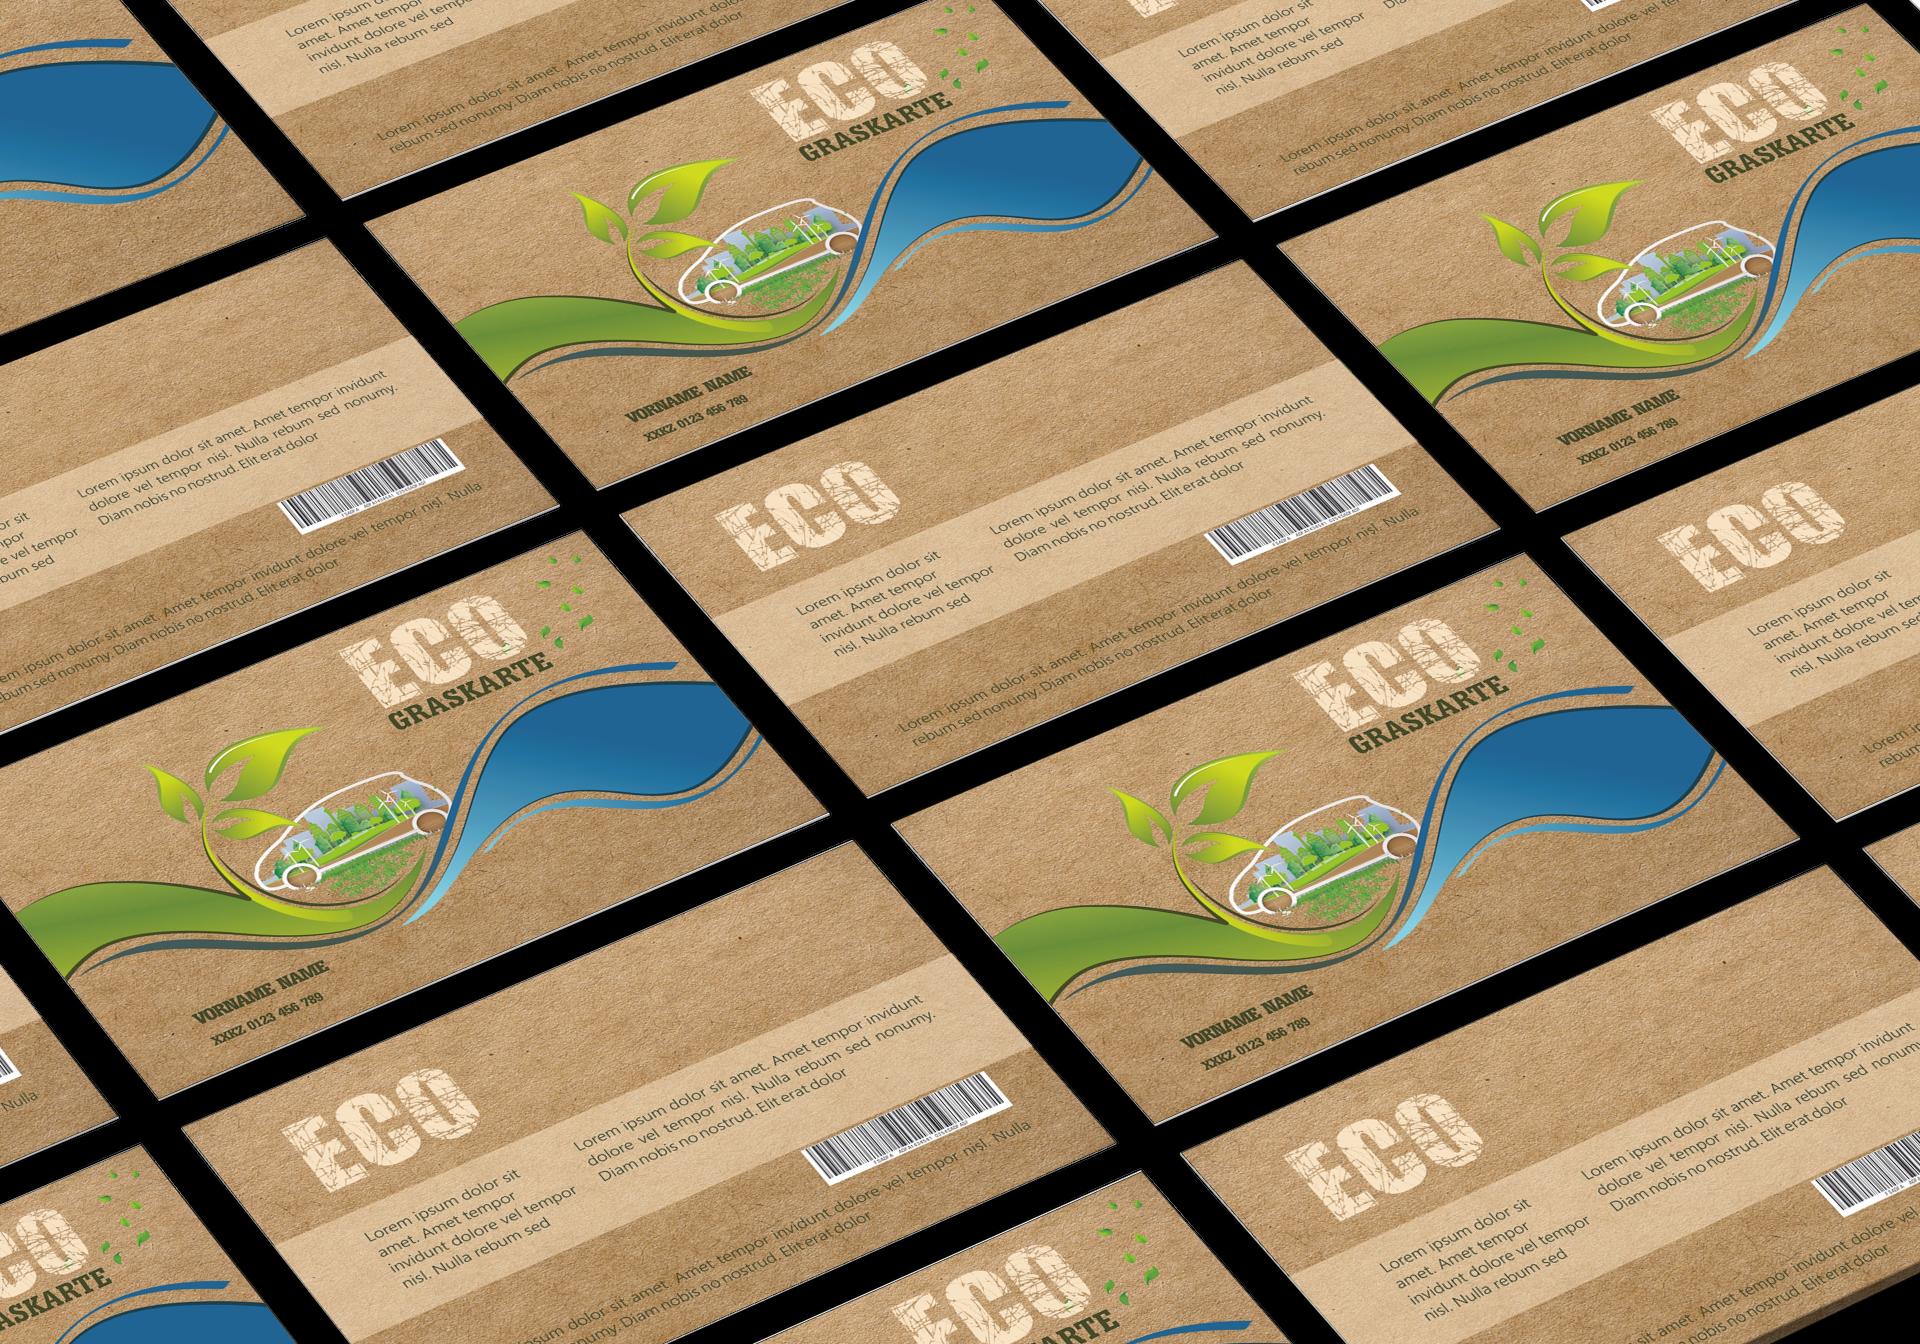 "GRASKARTE ""ECO"" Kundenkarte Design Vorlage GK-2019-000136"